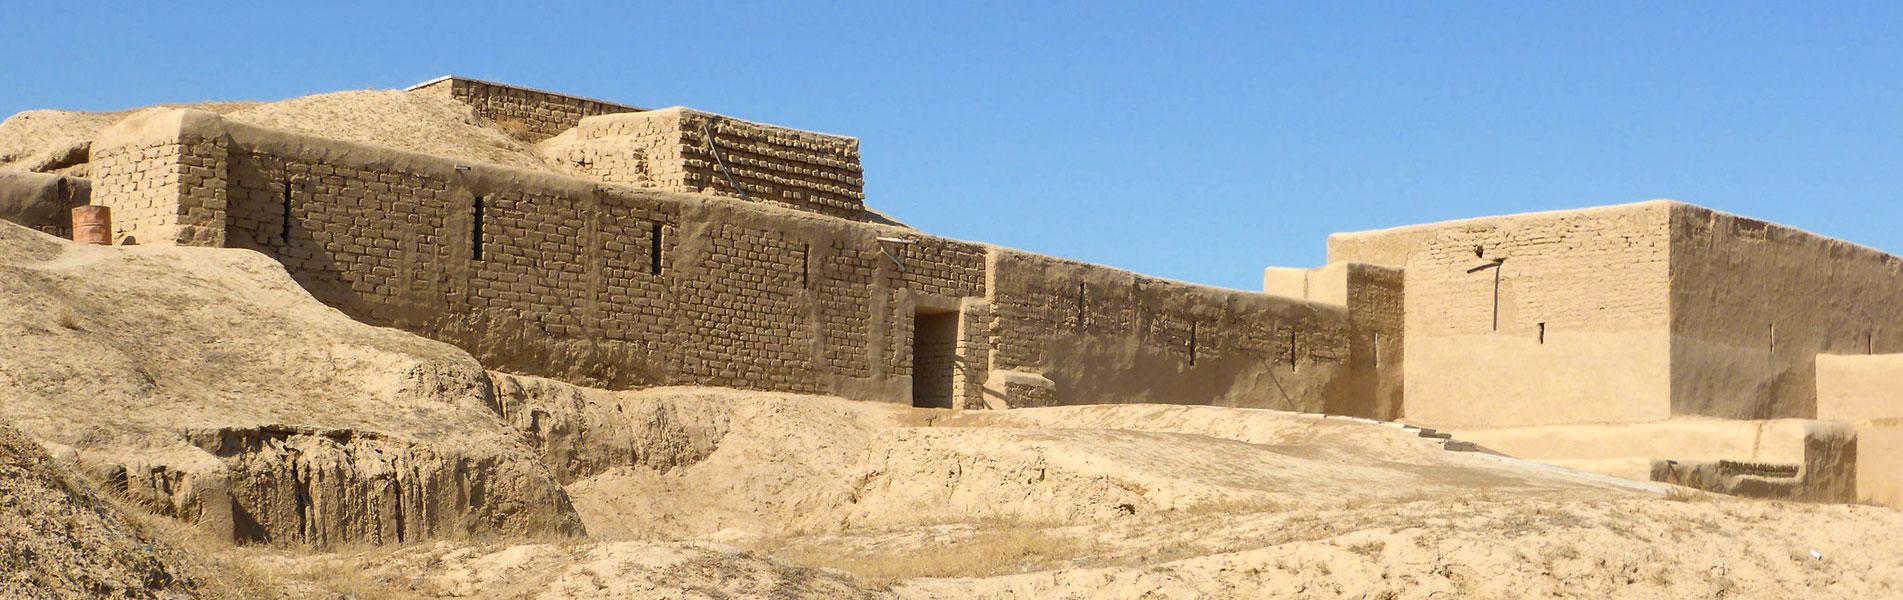 Nissa Ancient City